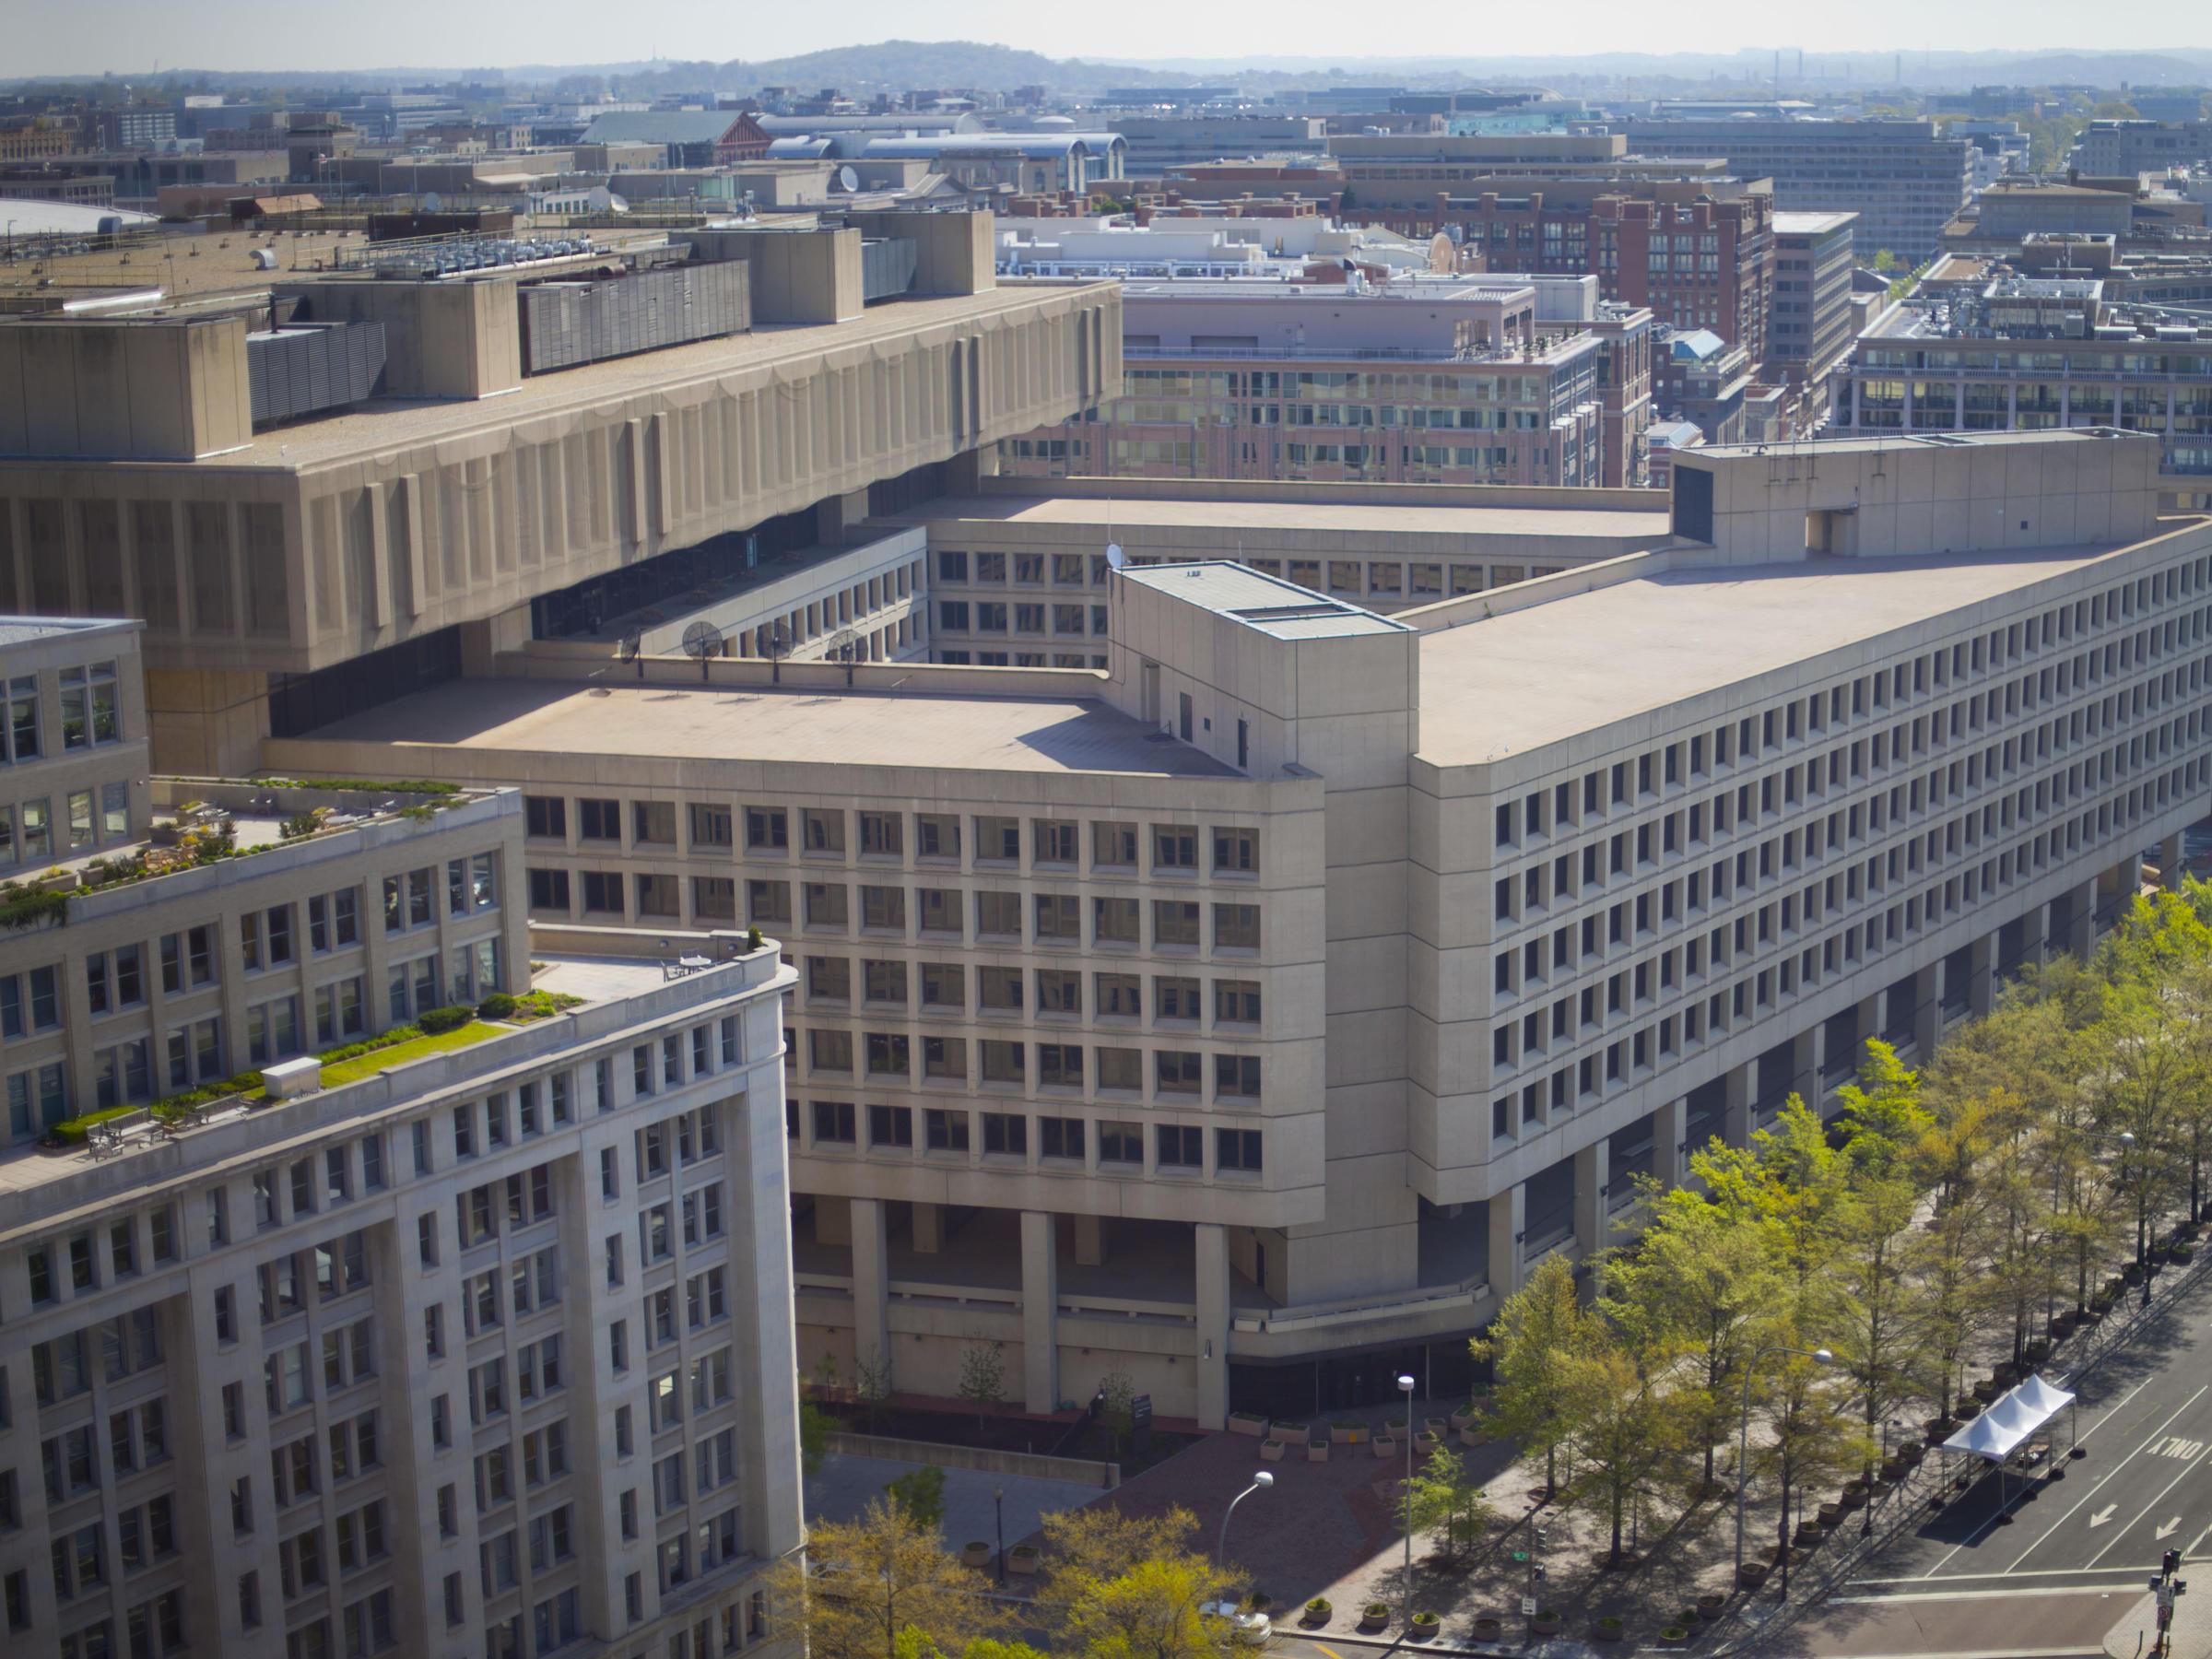 Panel Finds FBI Made Strides After Sept 11 But Must